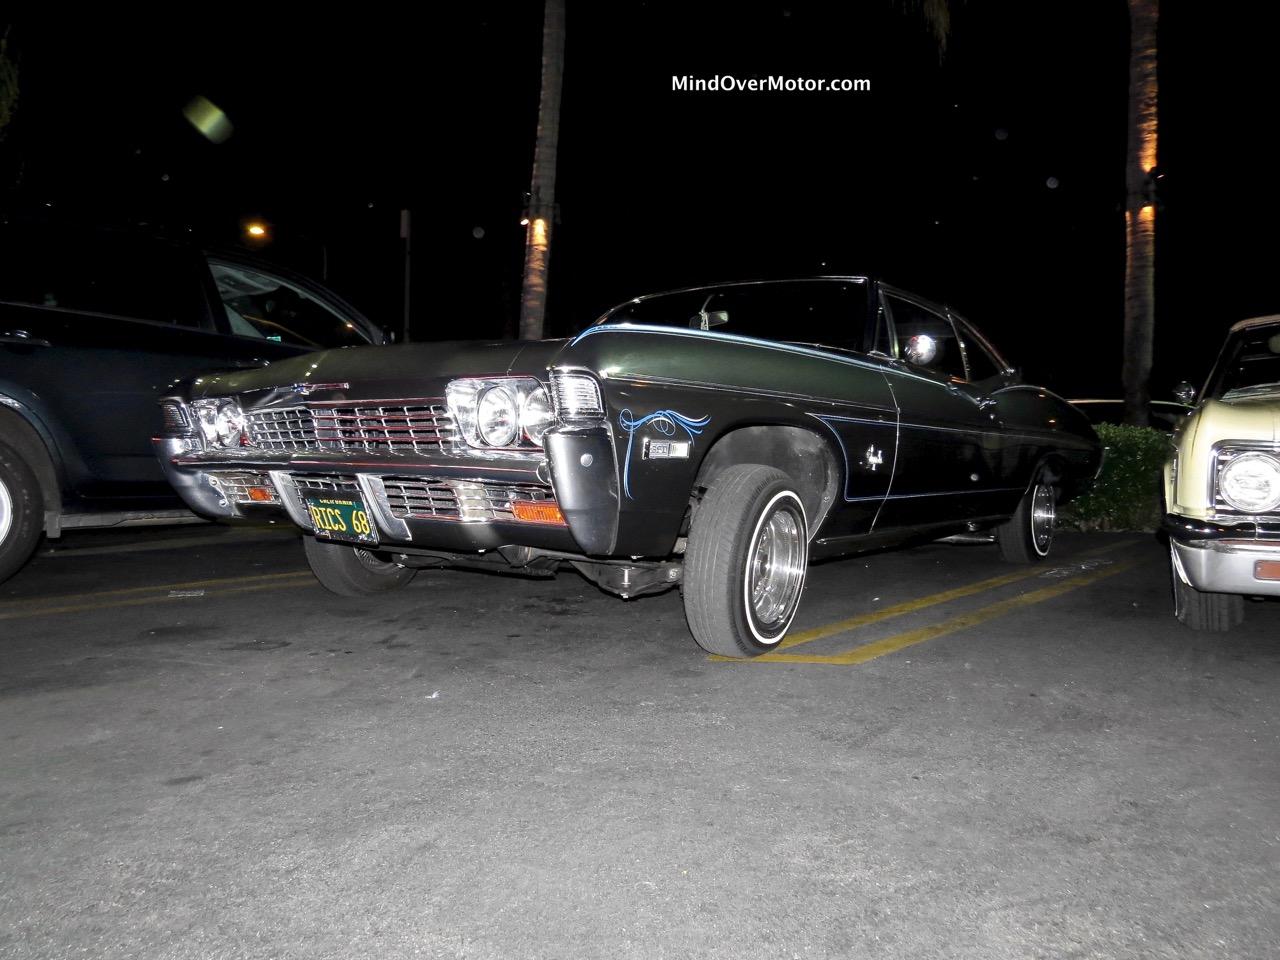 1968 Impala Lowrider